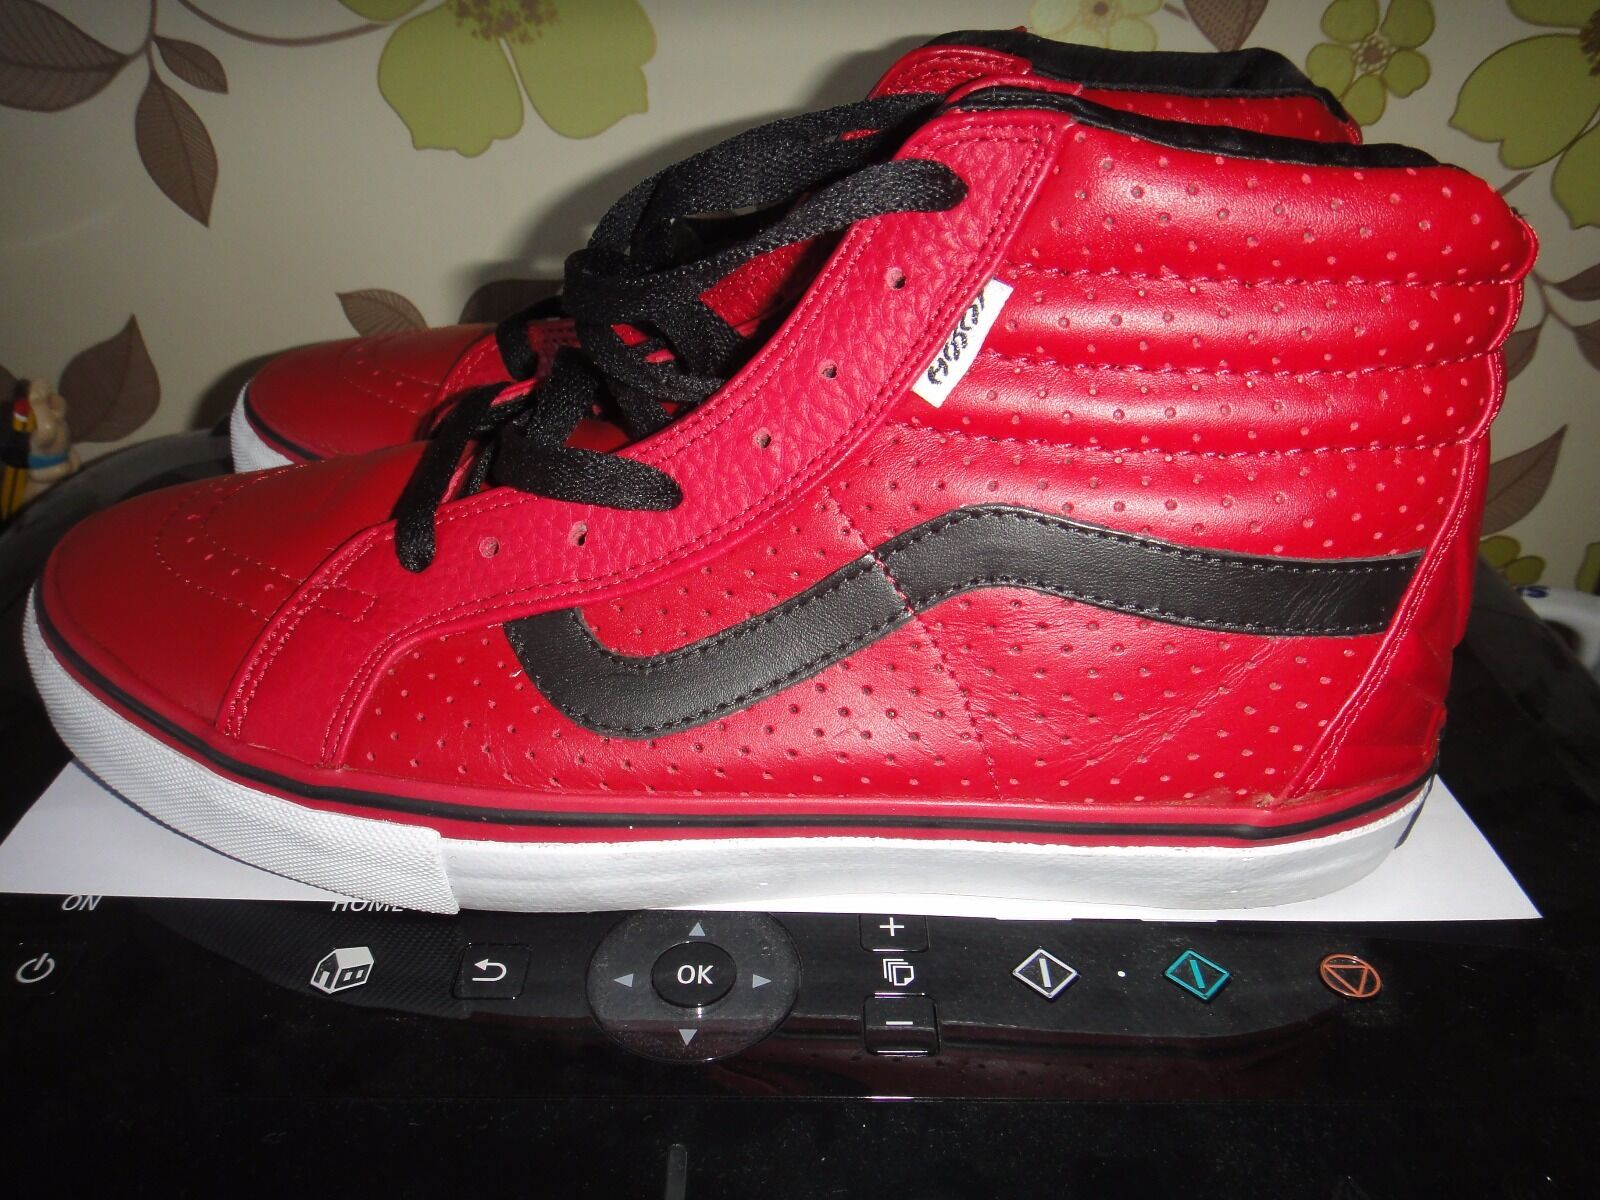 Vans Skateboarding SK8 Hi Vert Hosoi Hammerhead Rosso Pro Scarpa Taglia 8.5